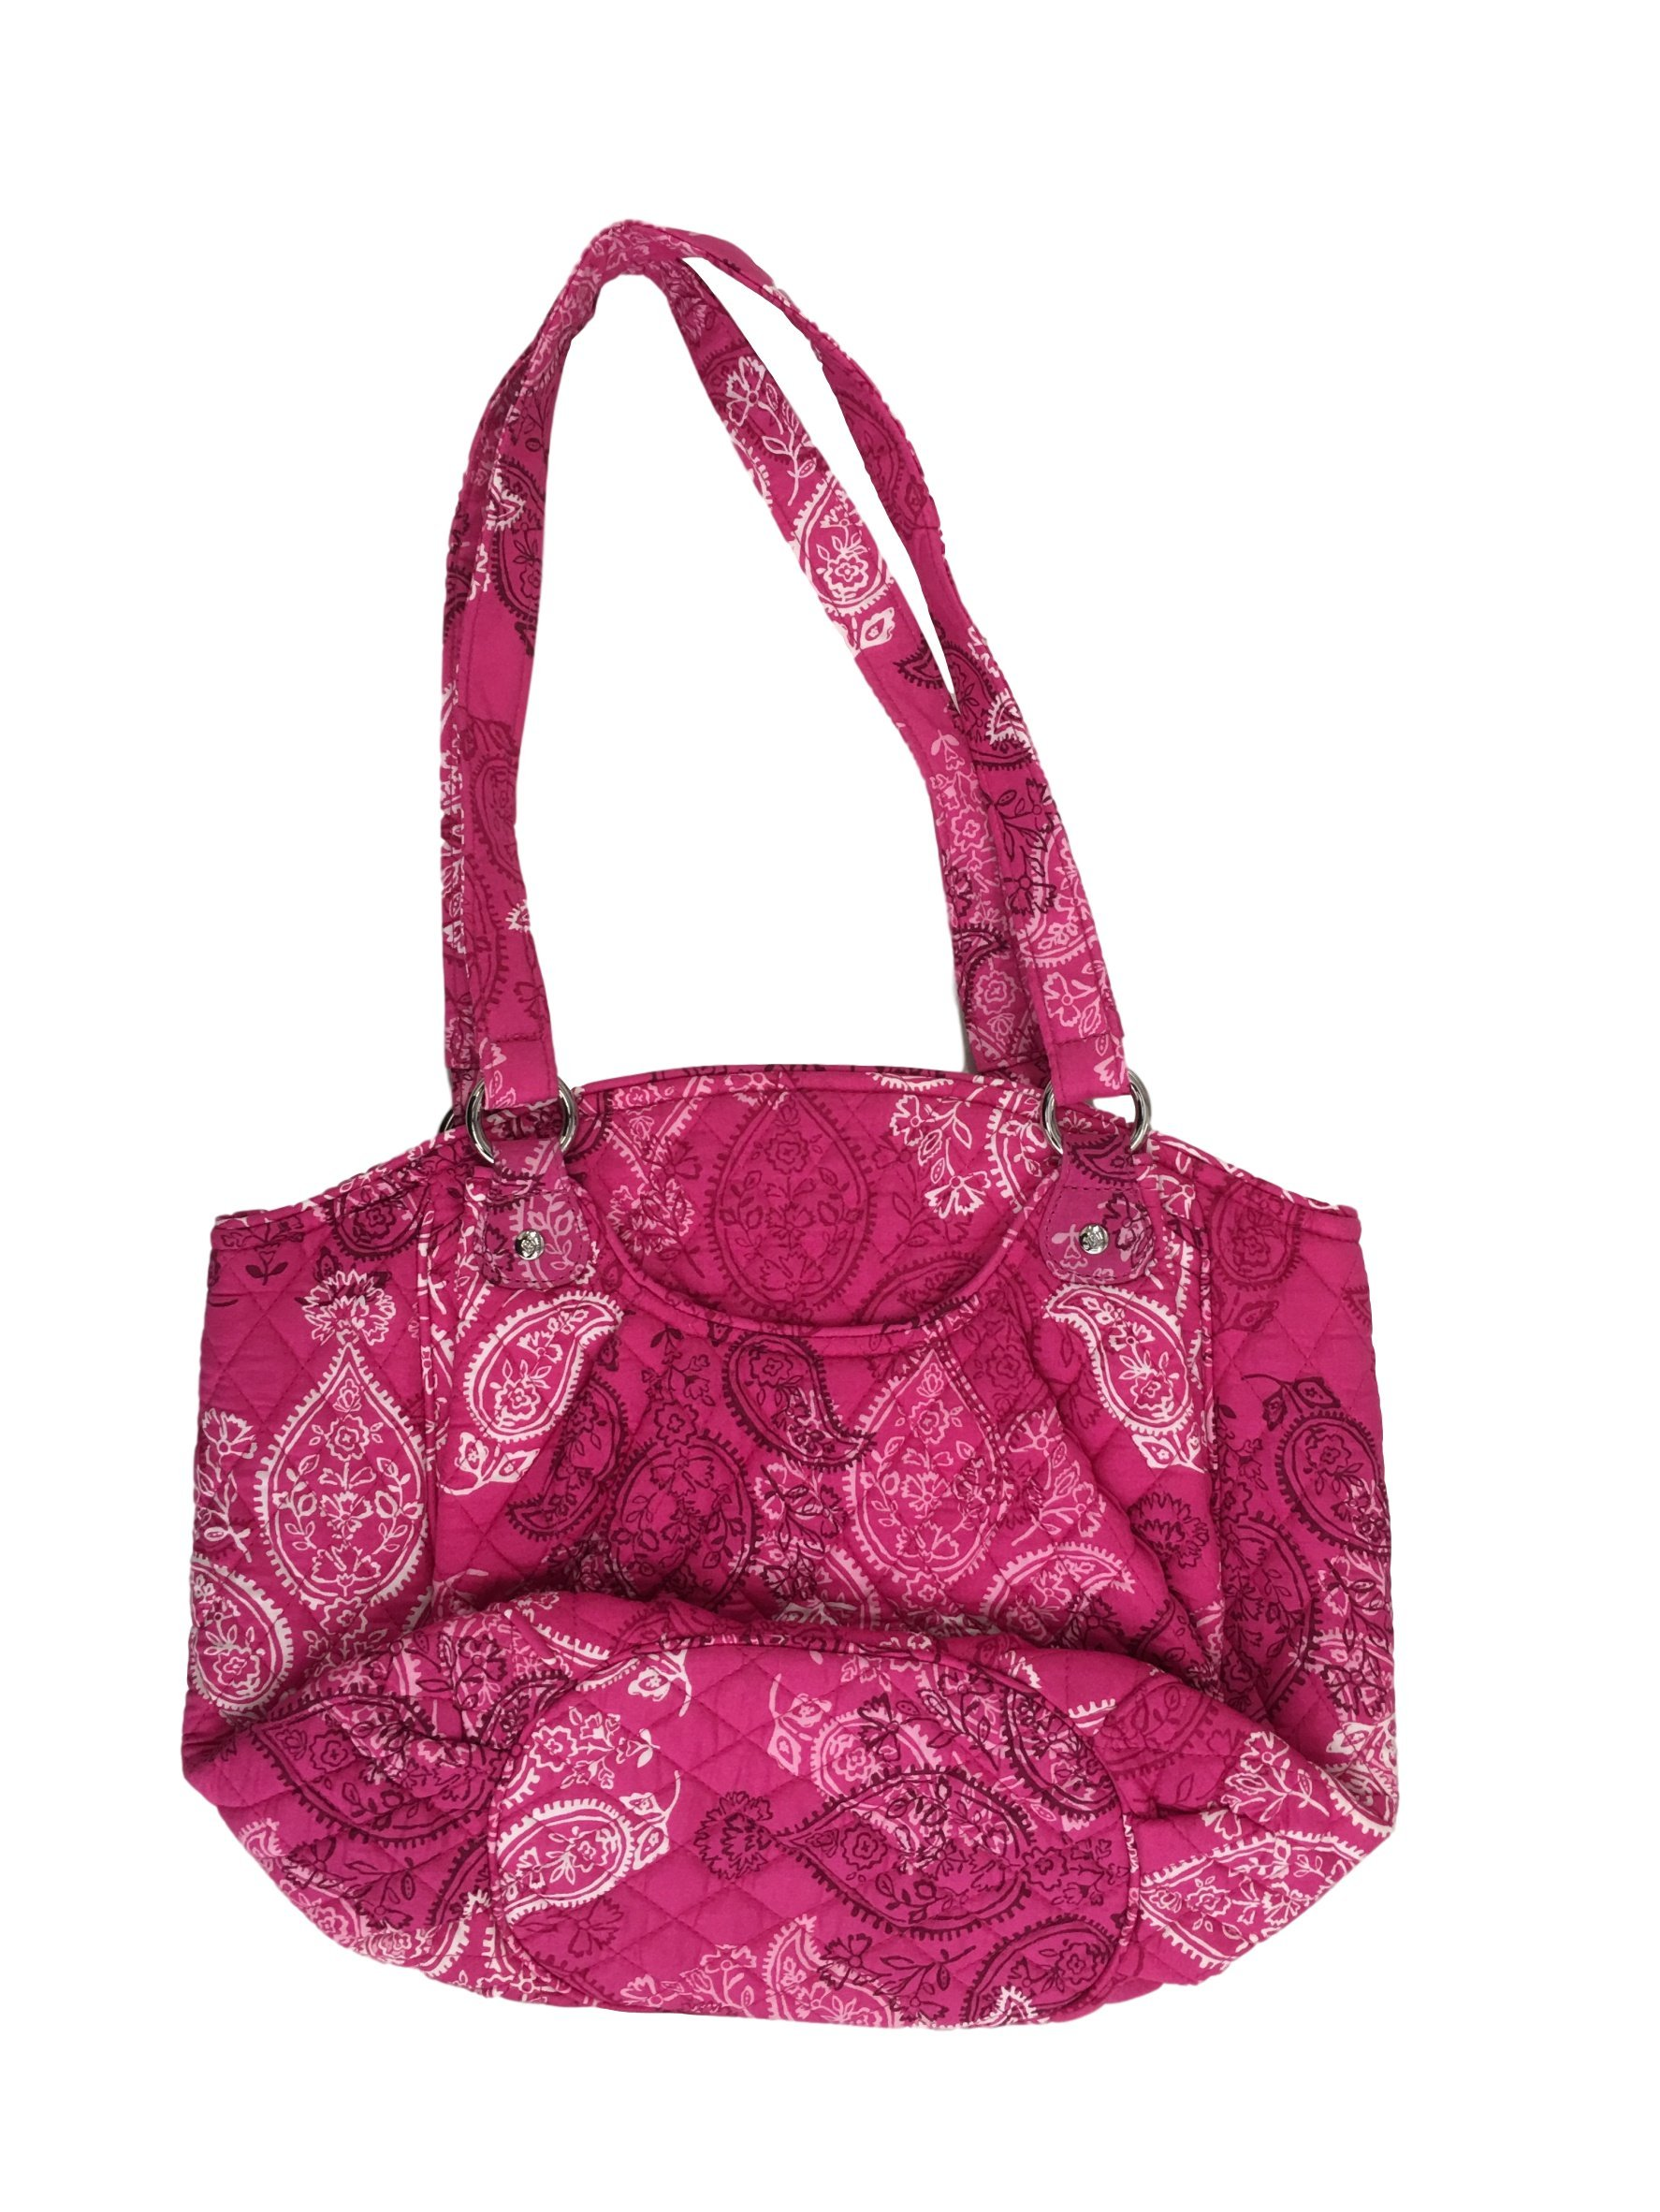 Vera Bradley Glenna Shoulder Bag, Signature Cotton (Stamped Paisley)